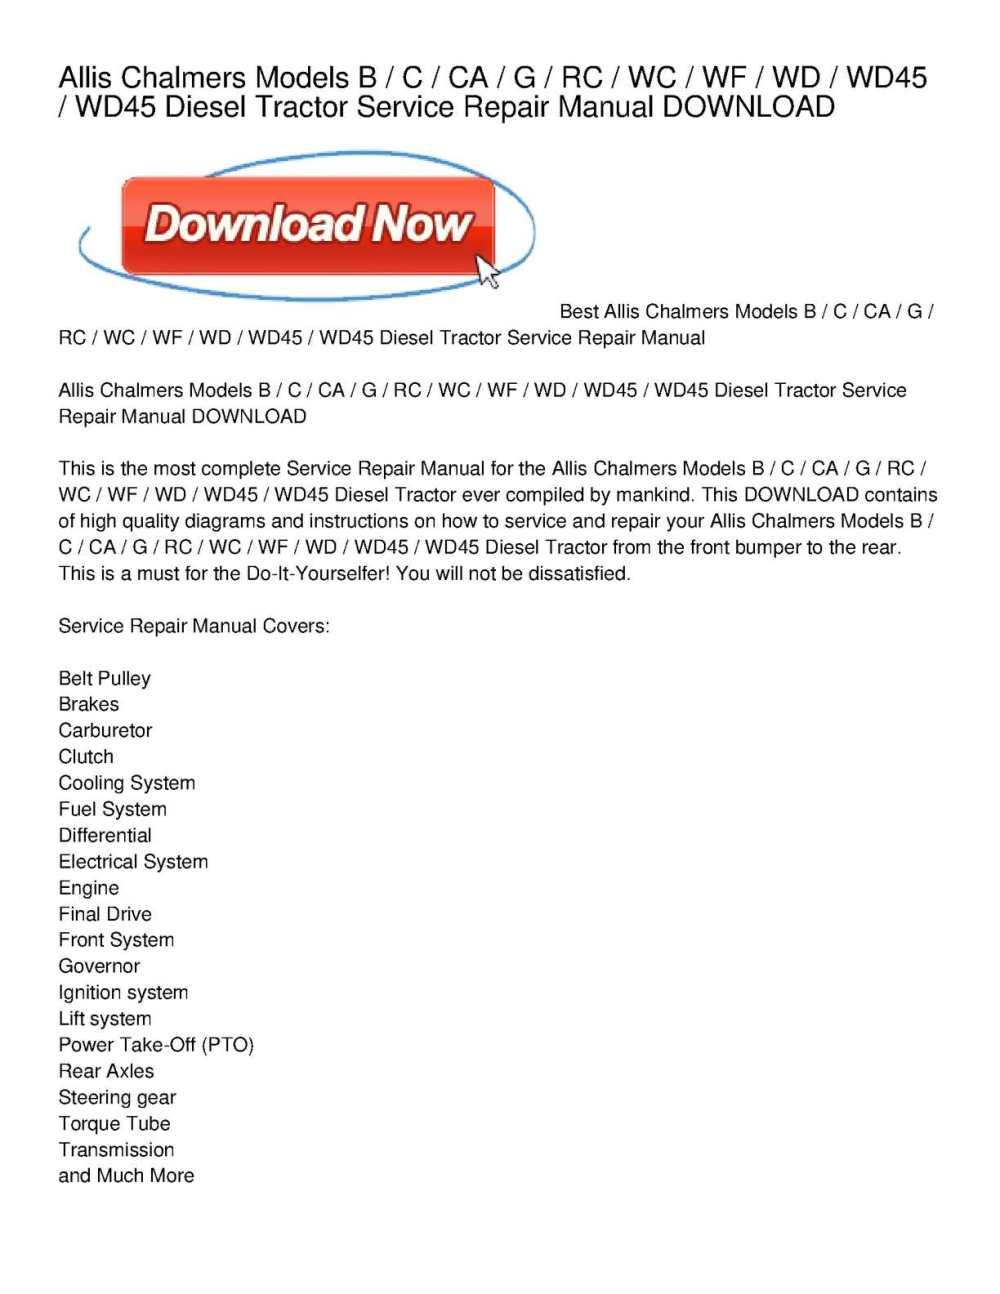 medium resolution of calam o allis chalmers models b c ca g rc wc wf wd wd45 wd45 diesel tractor service repair manual download